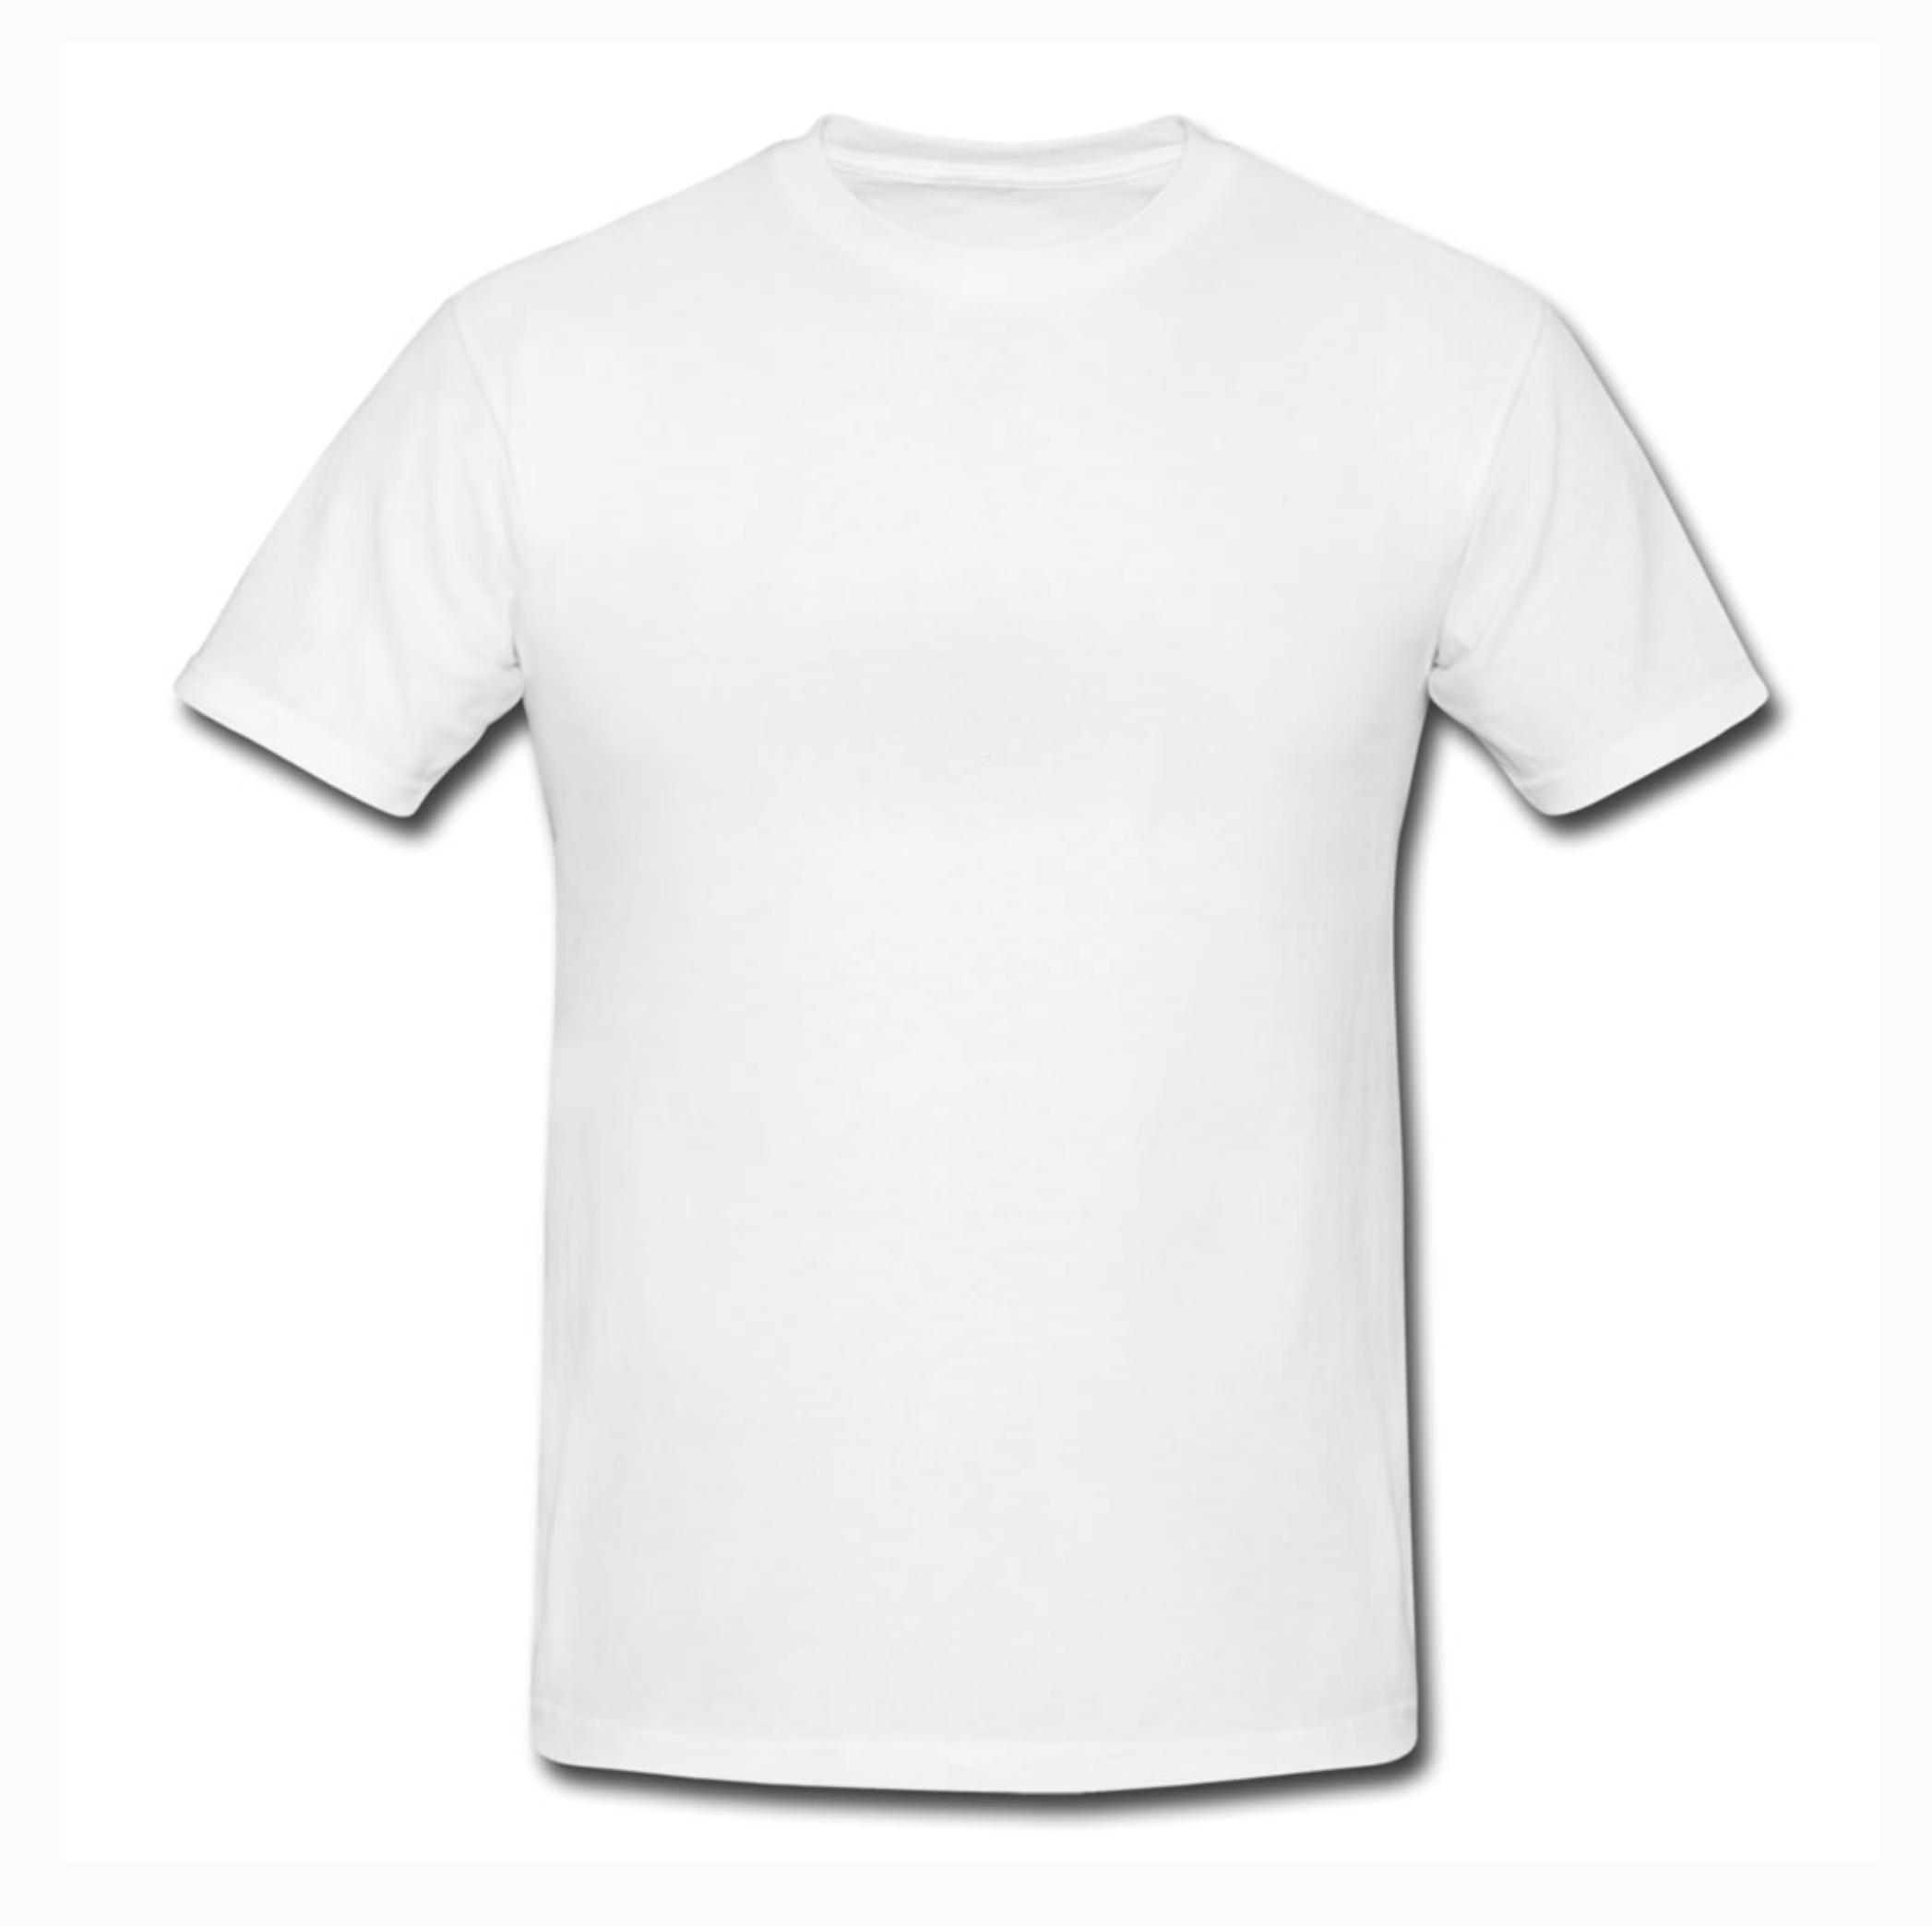 Plain White TShirt  Crested School Wear